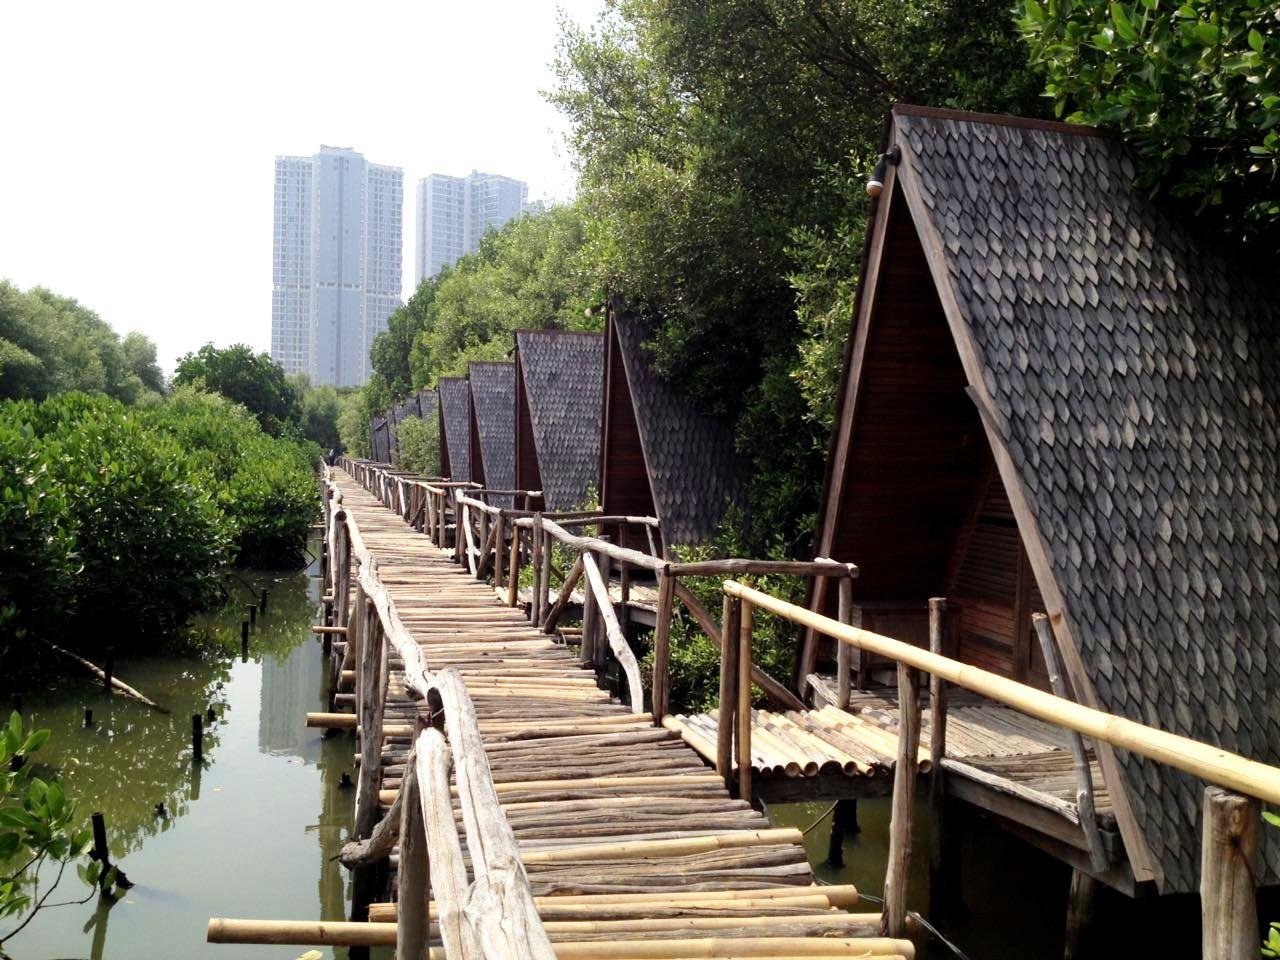 Wisata Murah Jakarta Hutan Mangrove Pantai Indah Kapuk - Winda